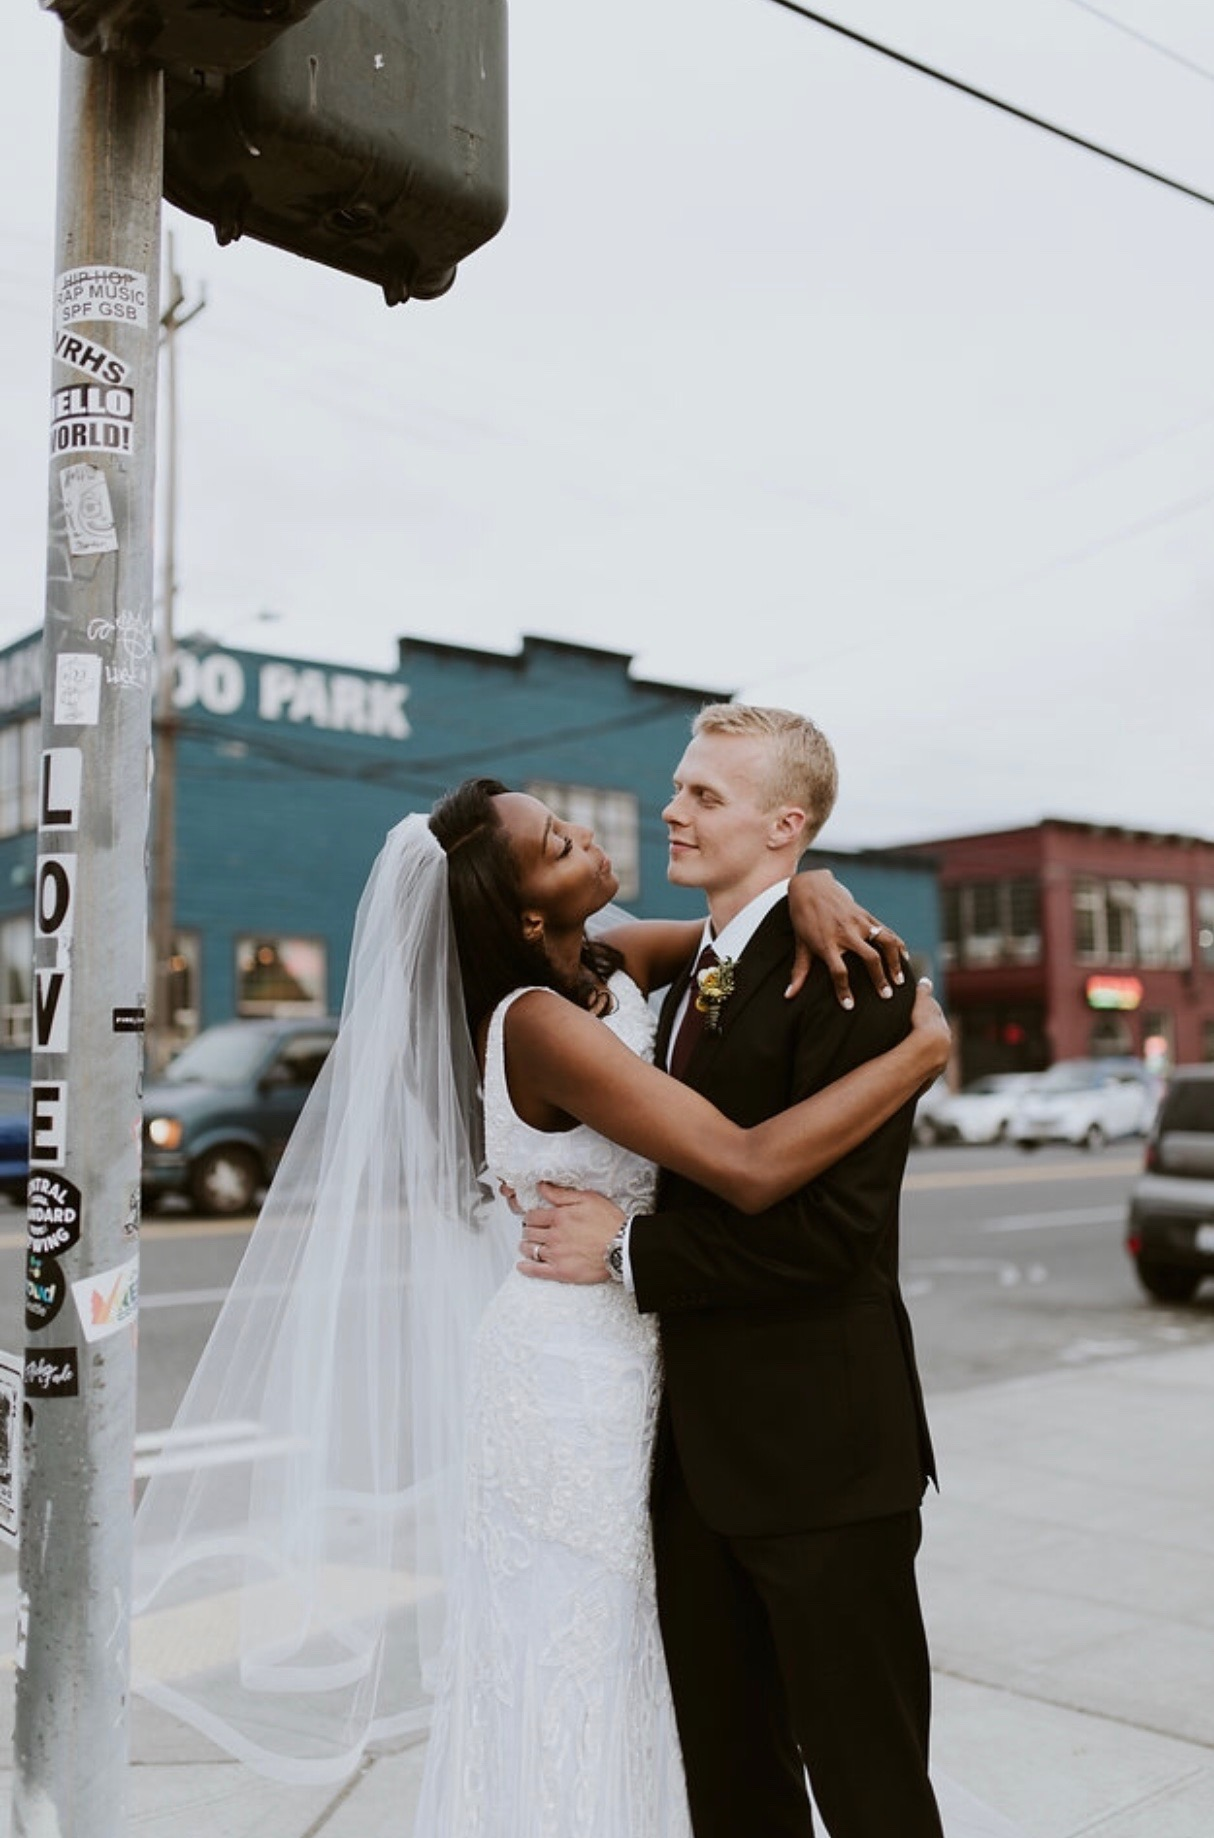 theia+bridal+wedding+dress+nashville.jpg